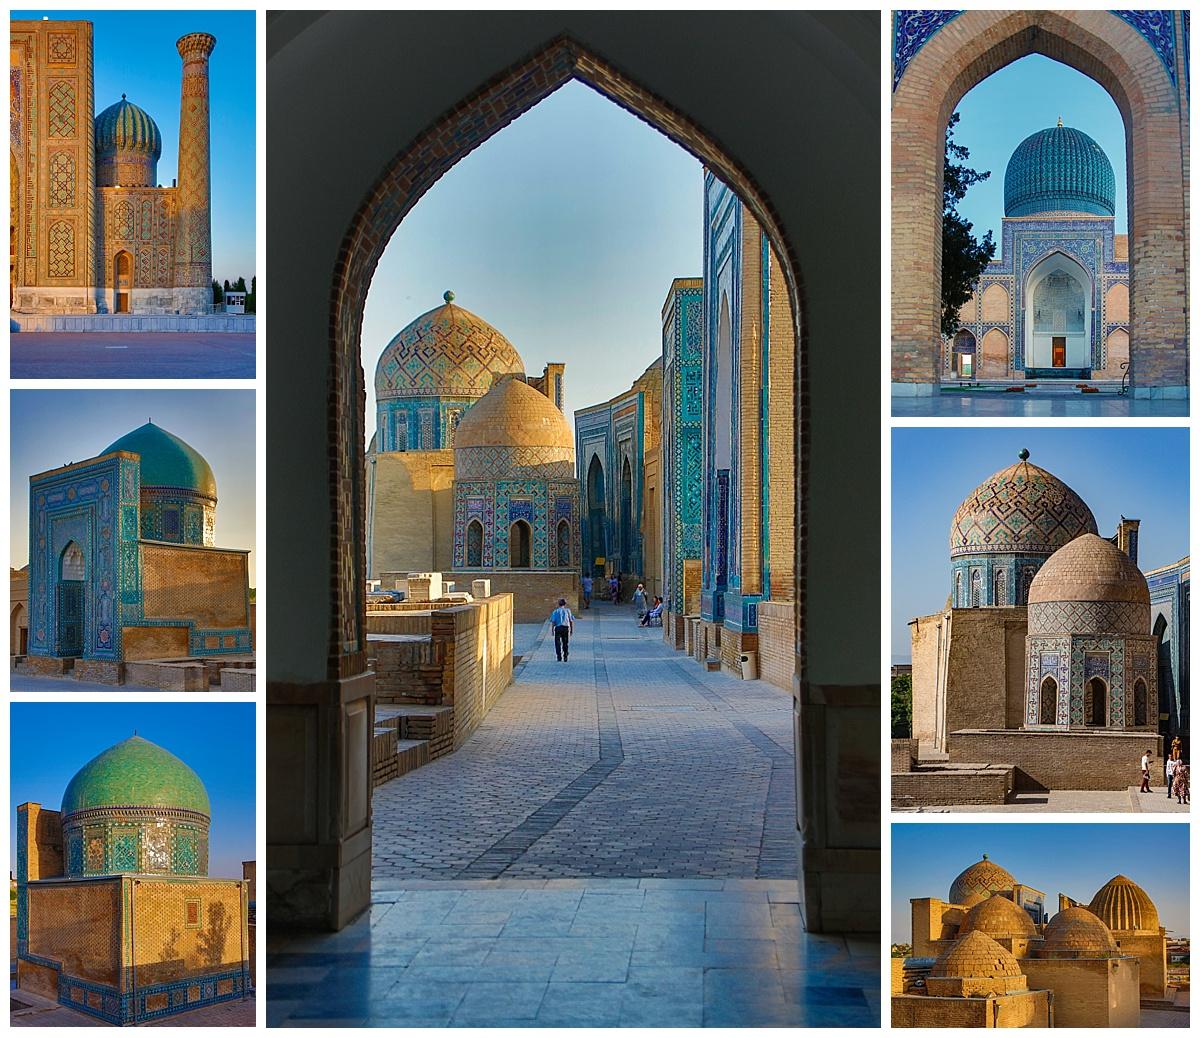 Samarkand, Uzbekistan - domes